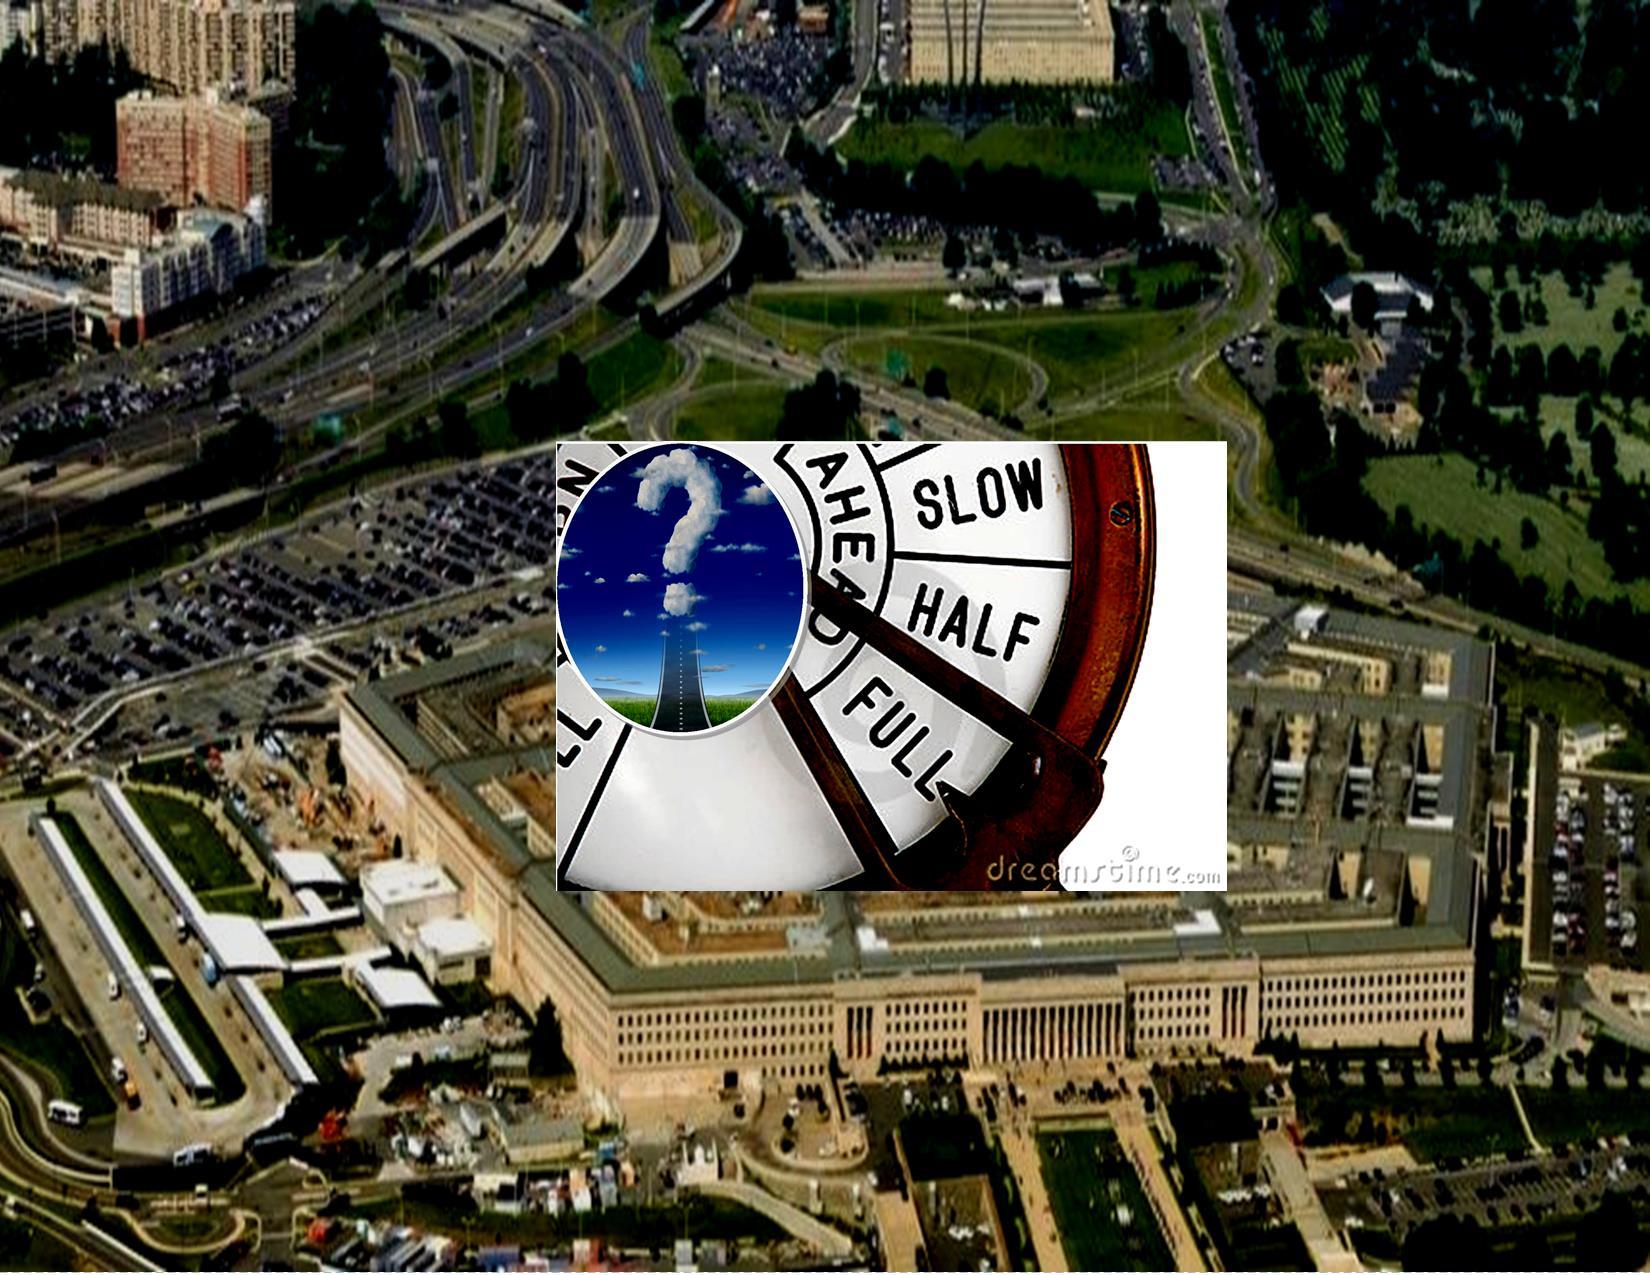 Pentagon Cloud Full Steam Ahead